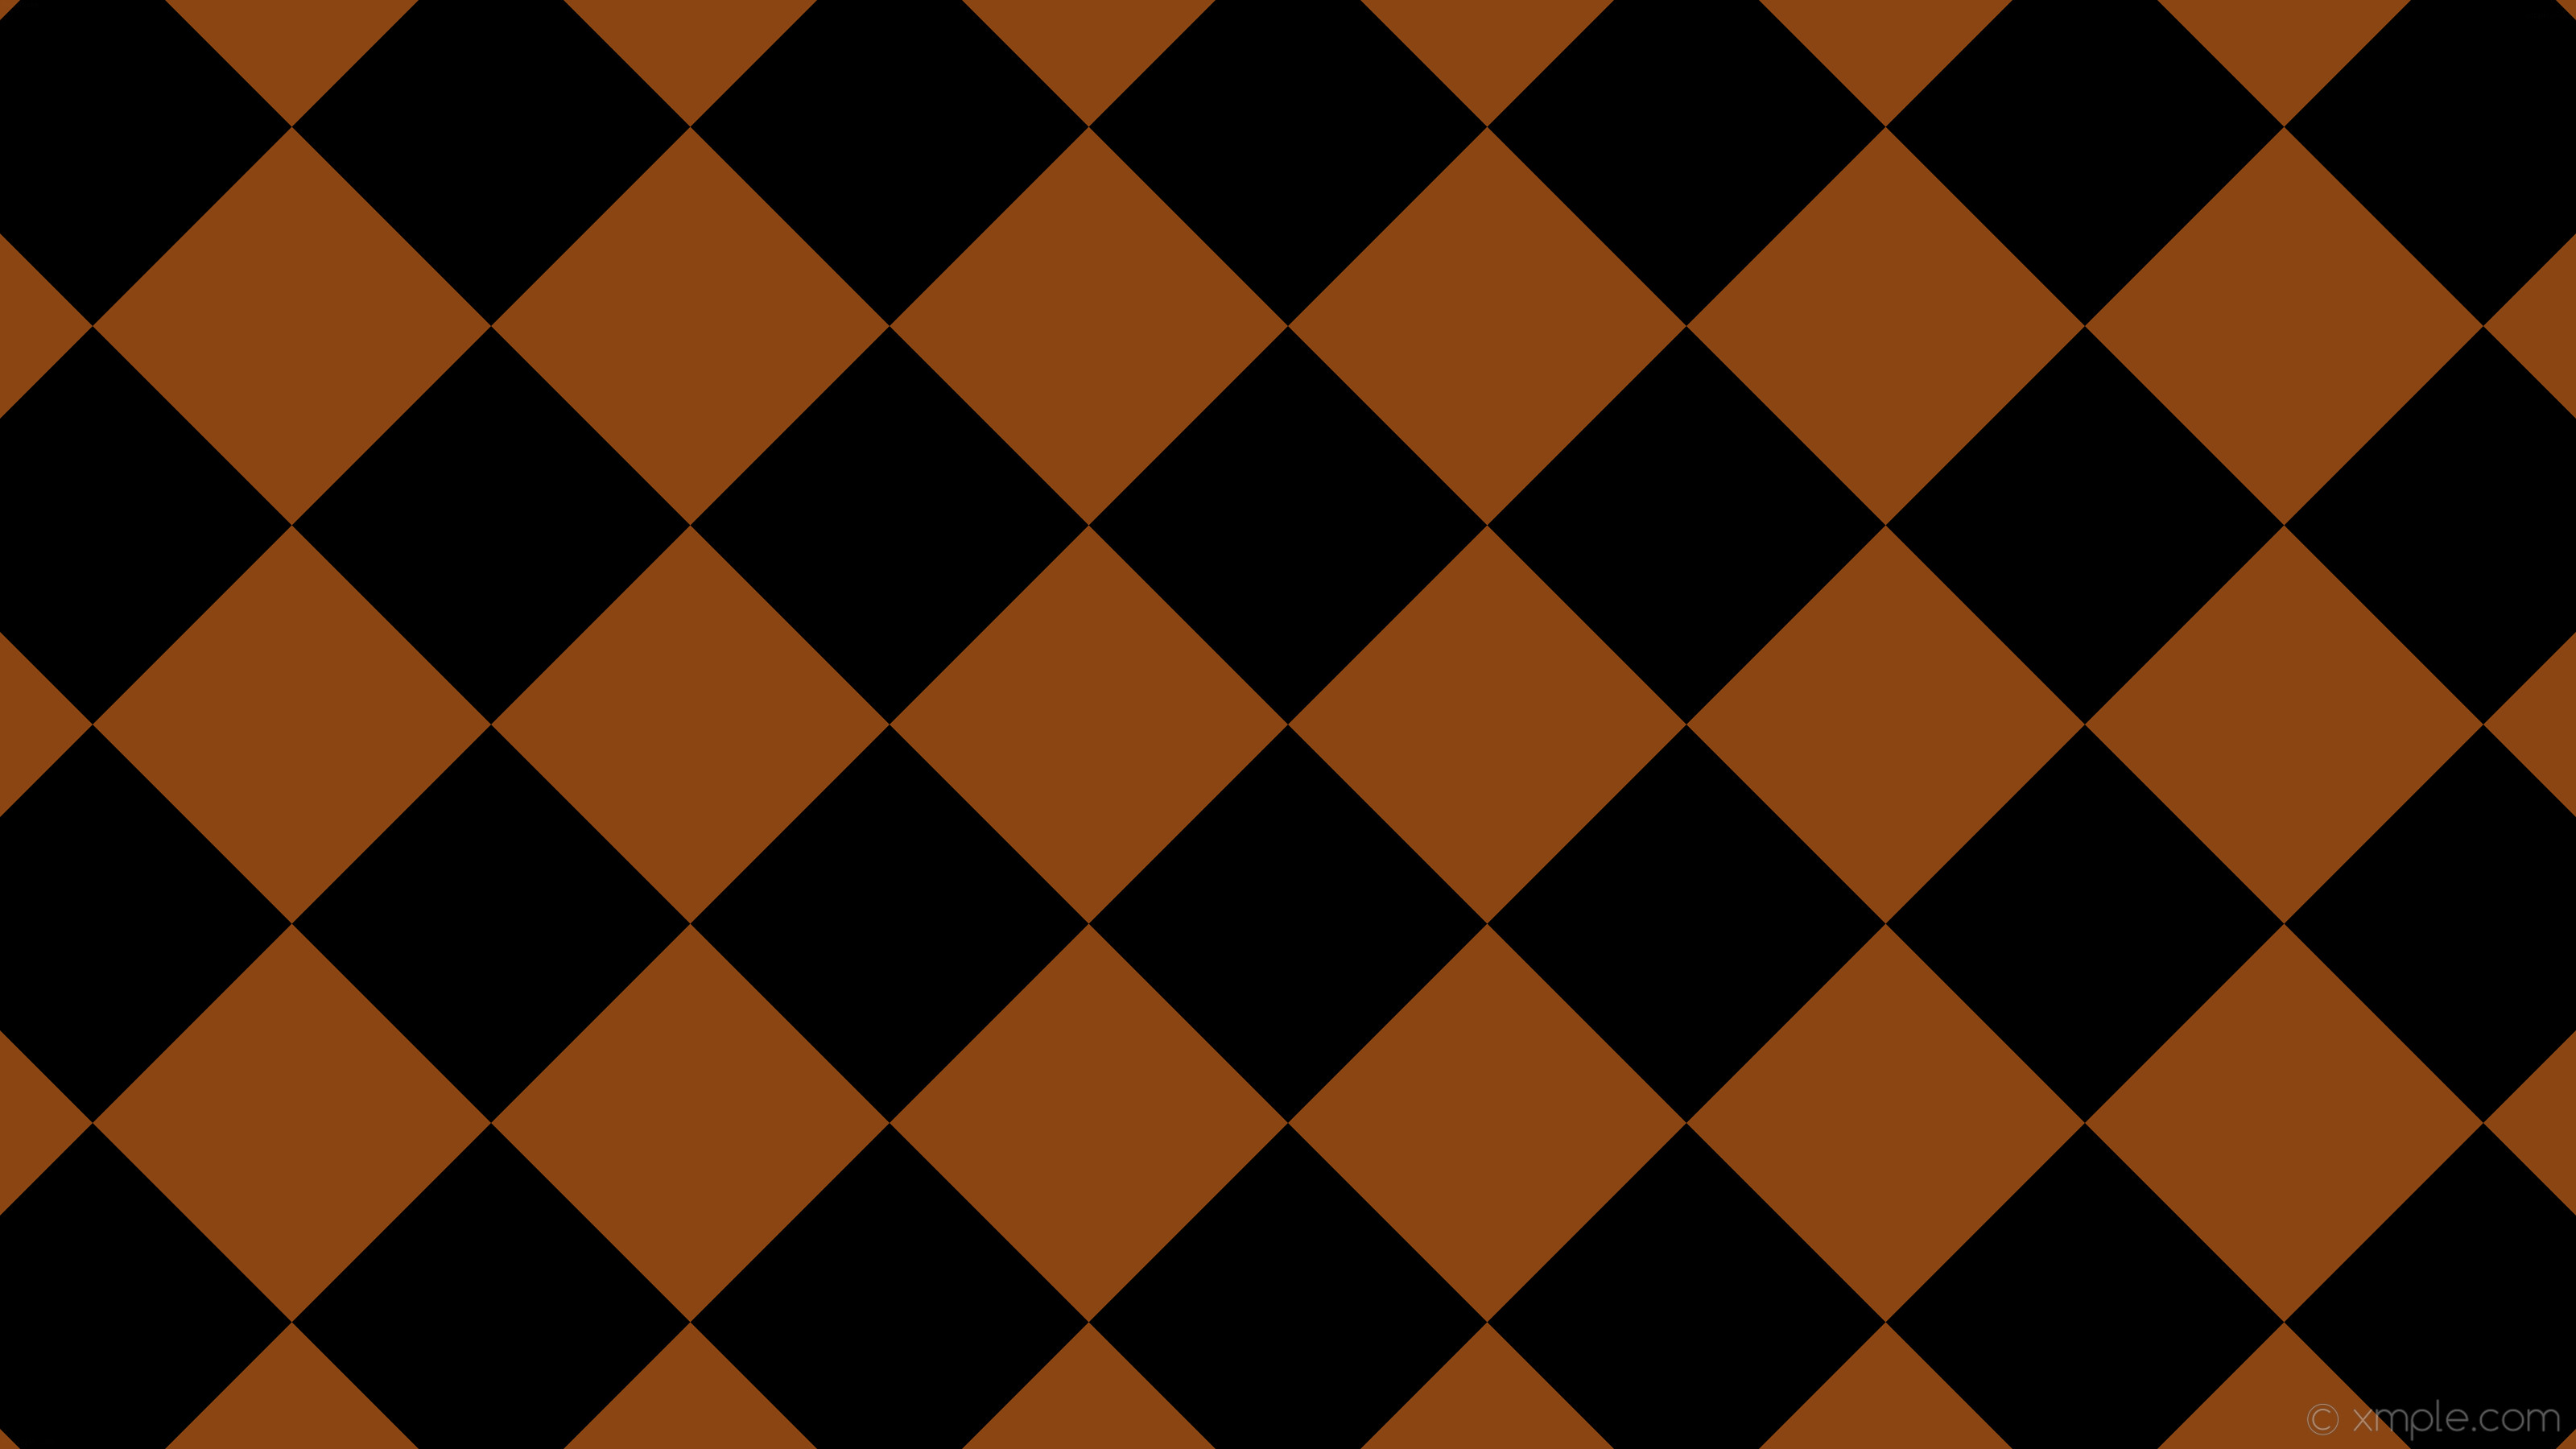 Wallpaper Squares Wallpaper Checkered Brown Squares Black 8b4513 000000  Diagonal